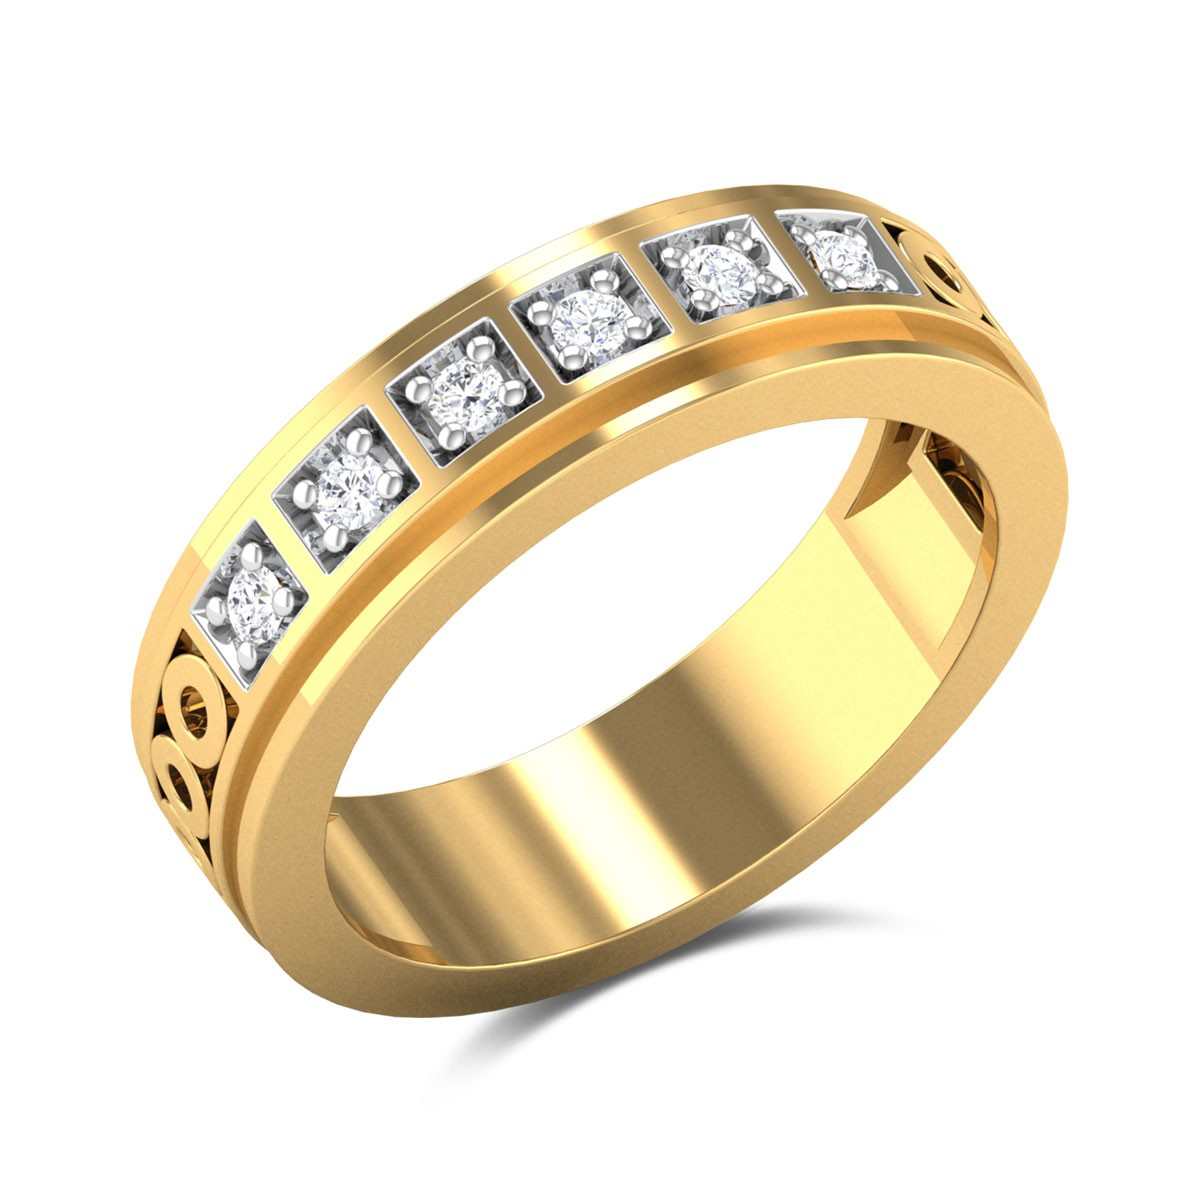 Bria Diamond Ring